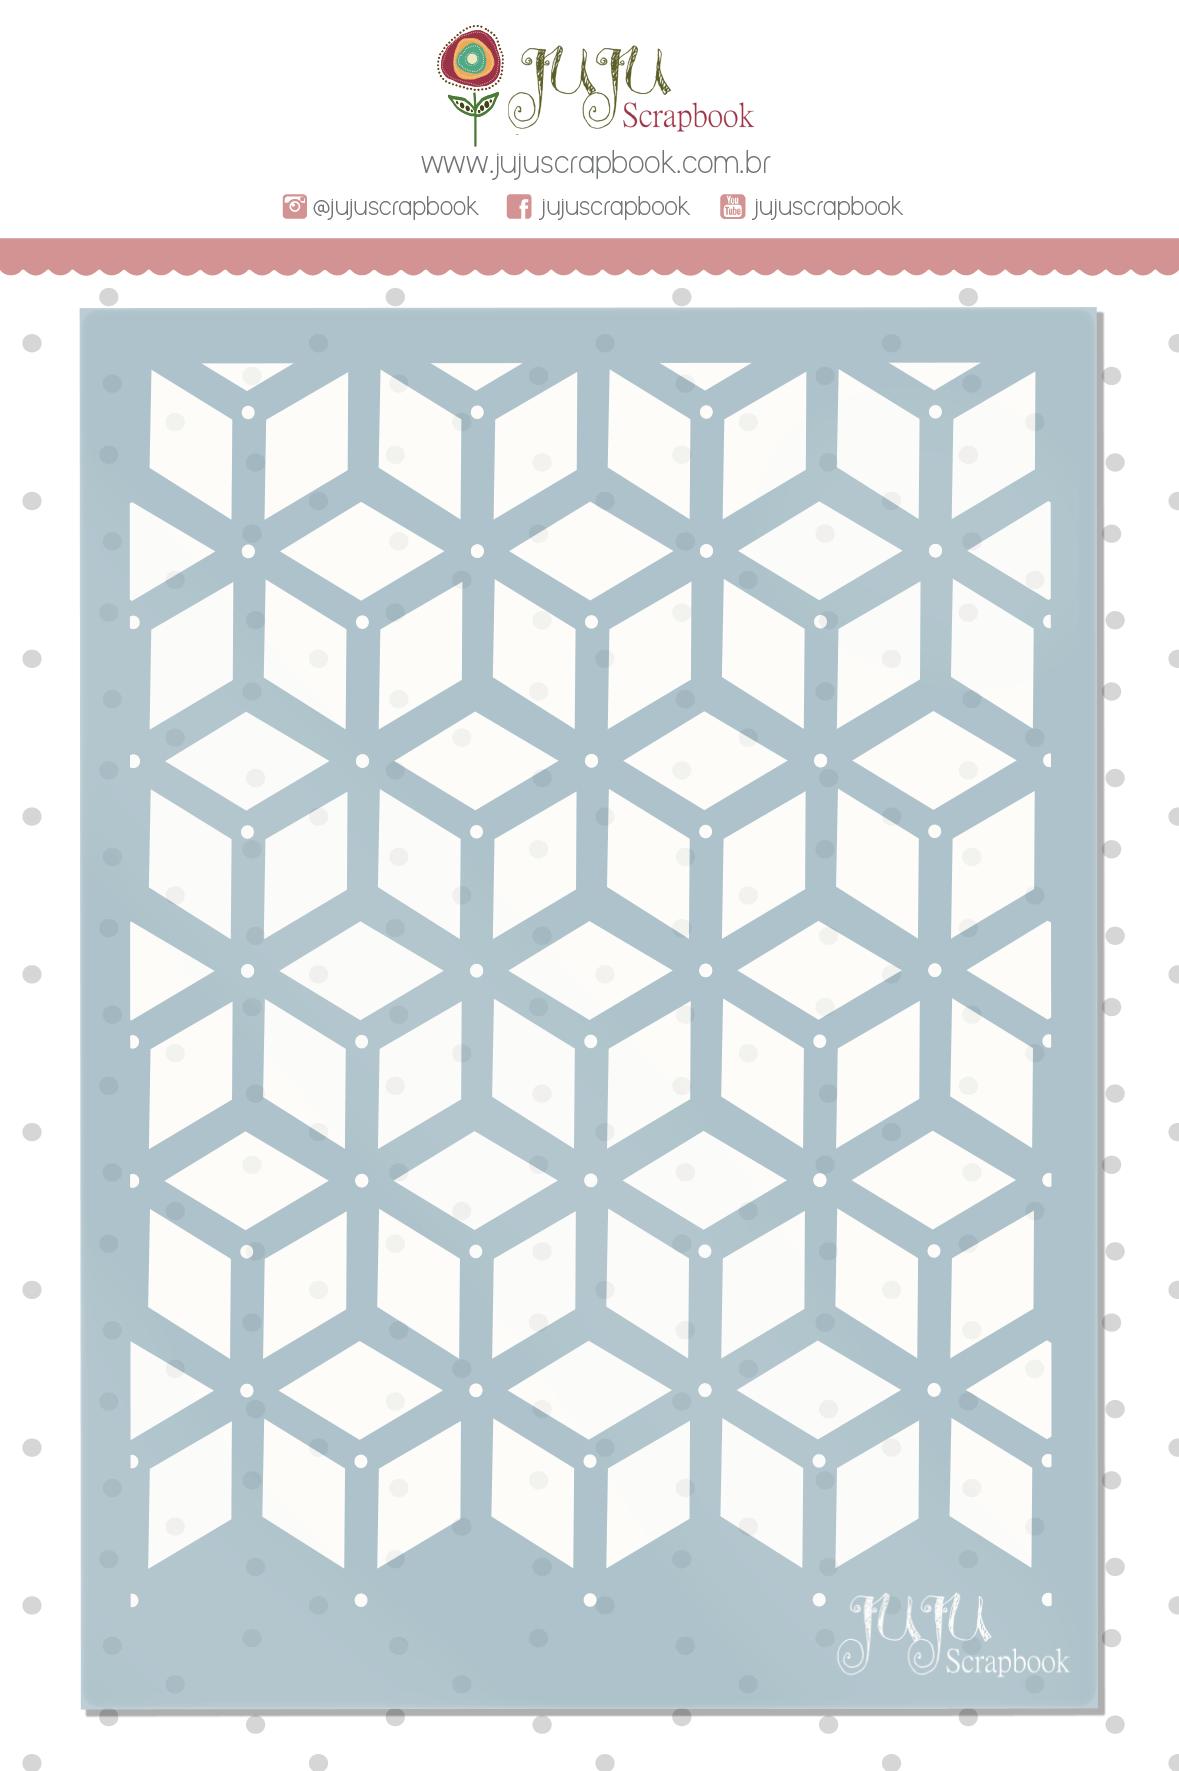 Stencil Arabesco Geométrico - Coleção Quarentena Criativa - Juju Scrapbook  - JuJu Scrapbook